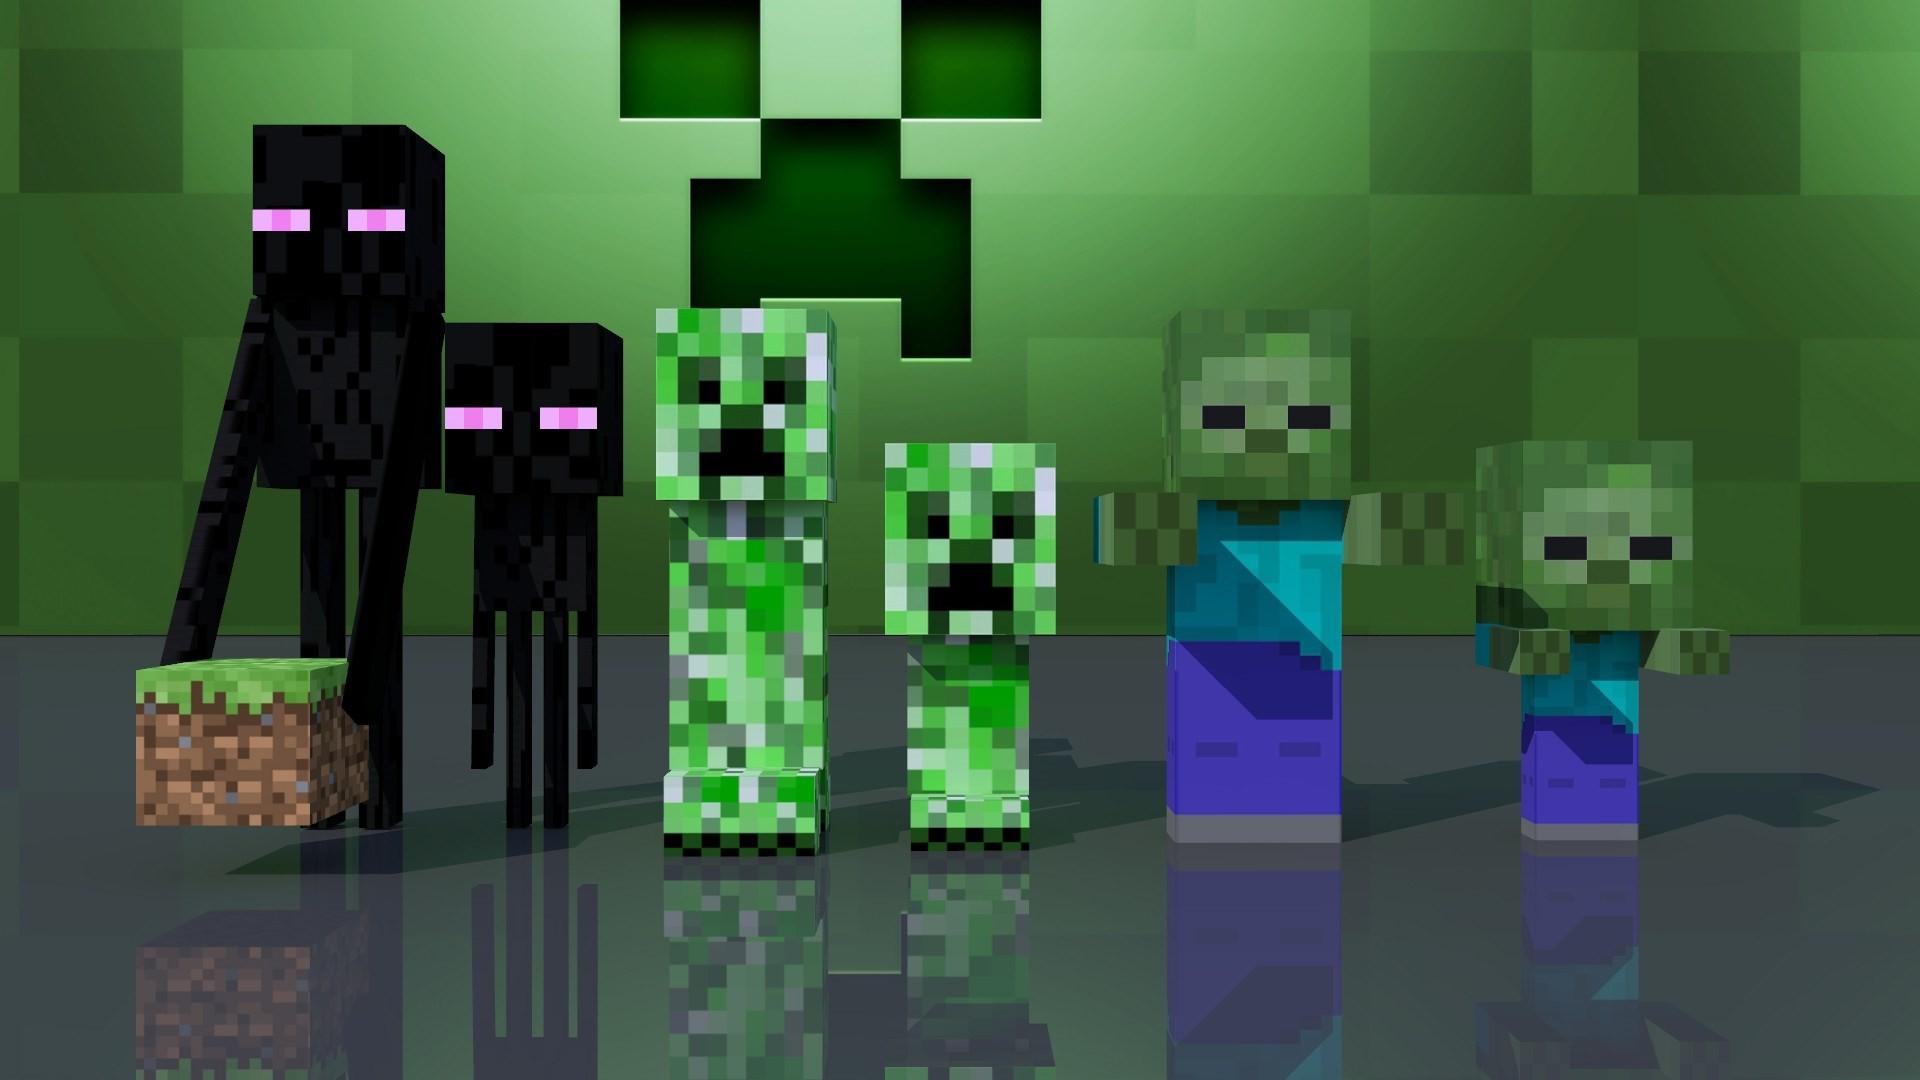 Must see Wallpaper Minecraft Universe - 706082-minecraft-desktop-backgrounds-1920x1080-large-resolution  Gallery_291882.jpg